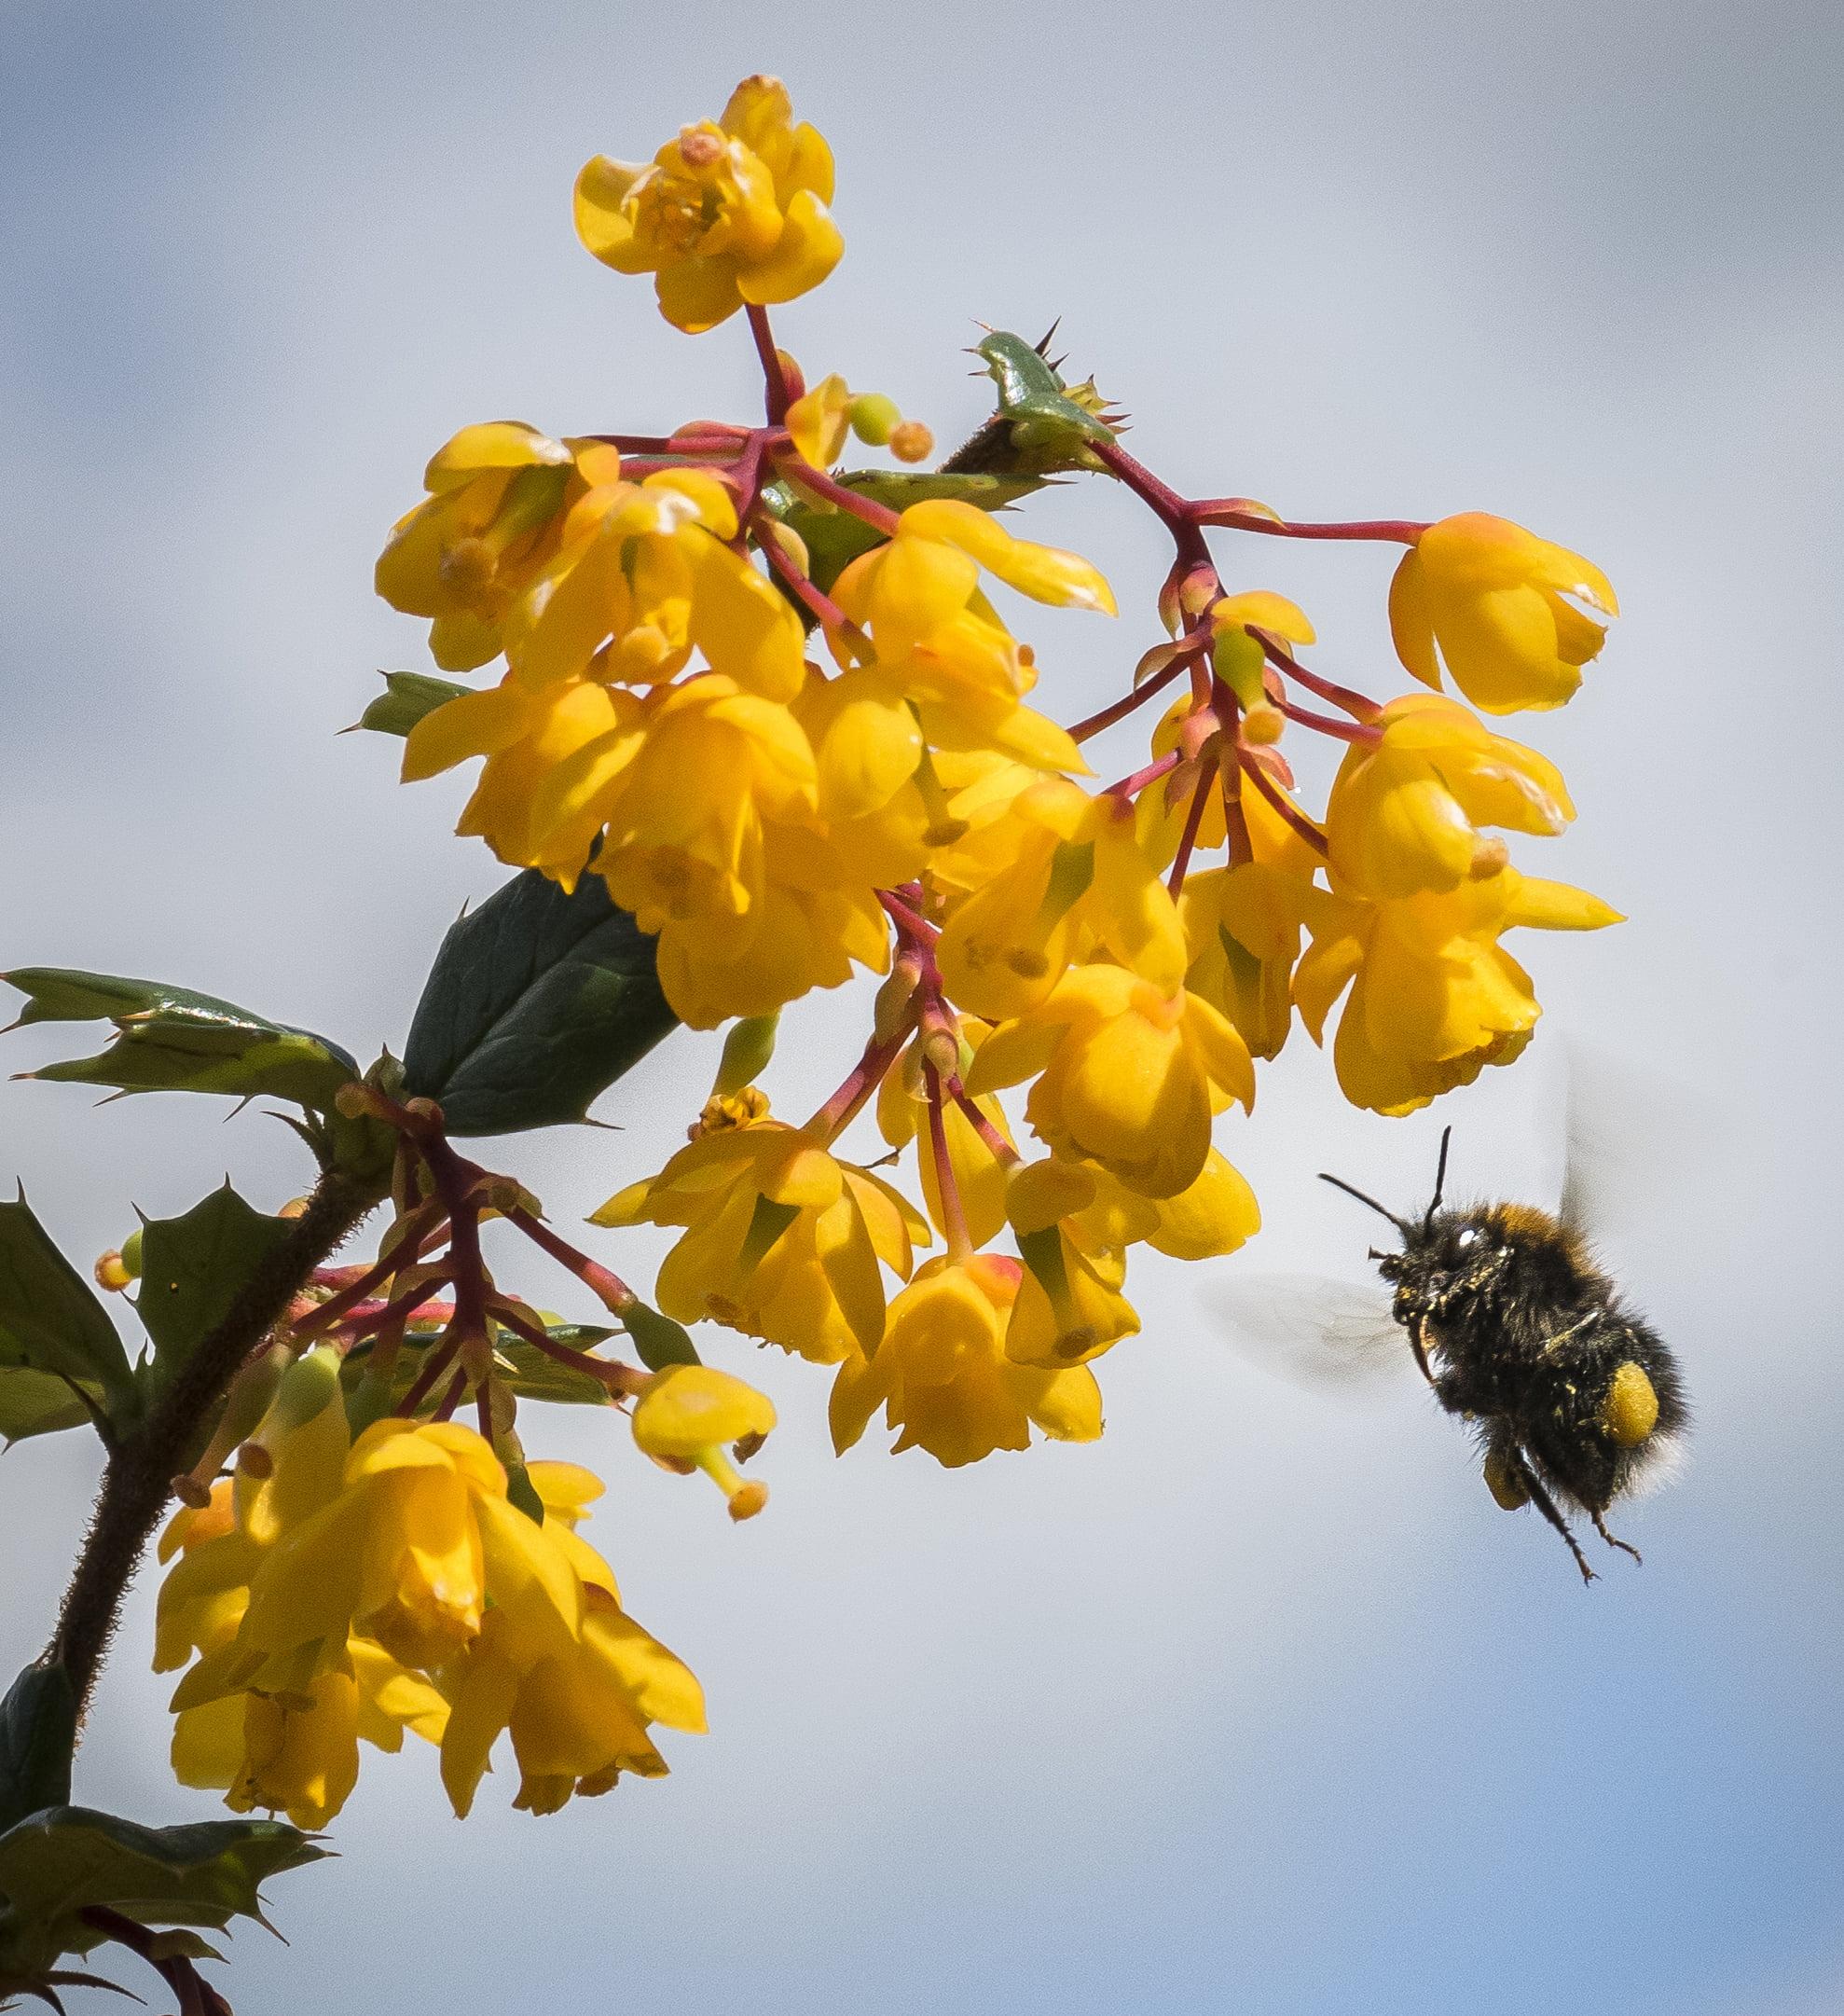 Yellow Berberis flowers with bee